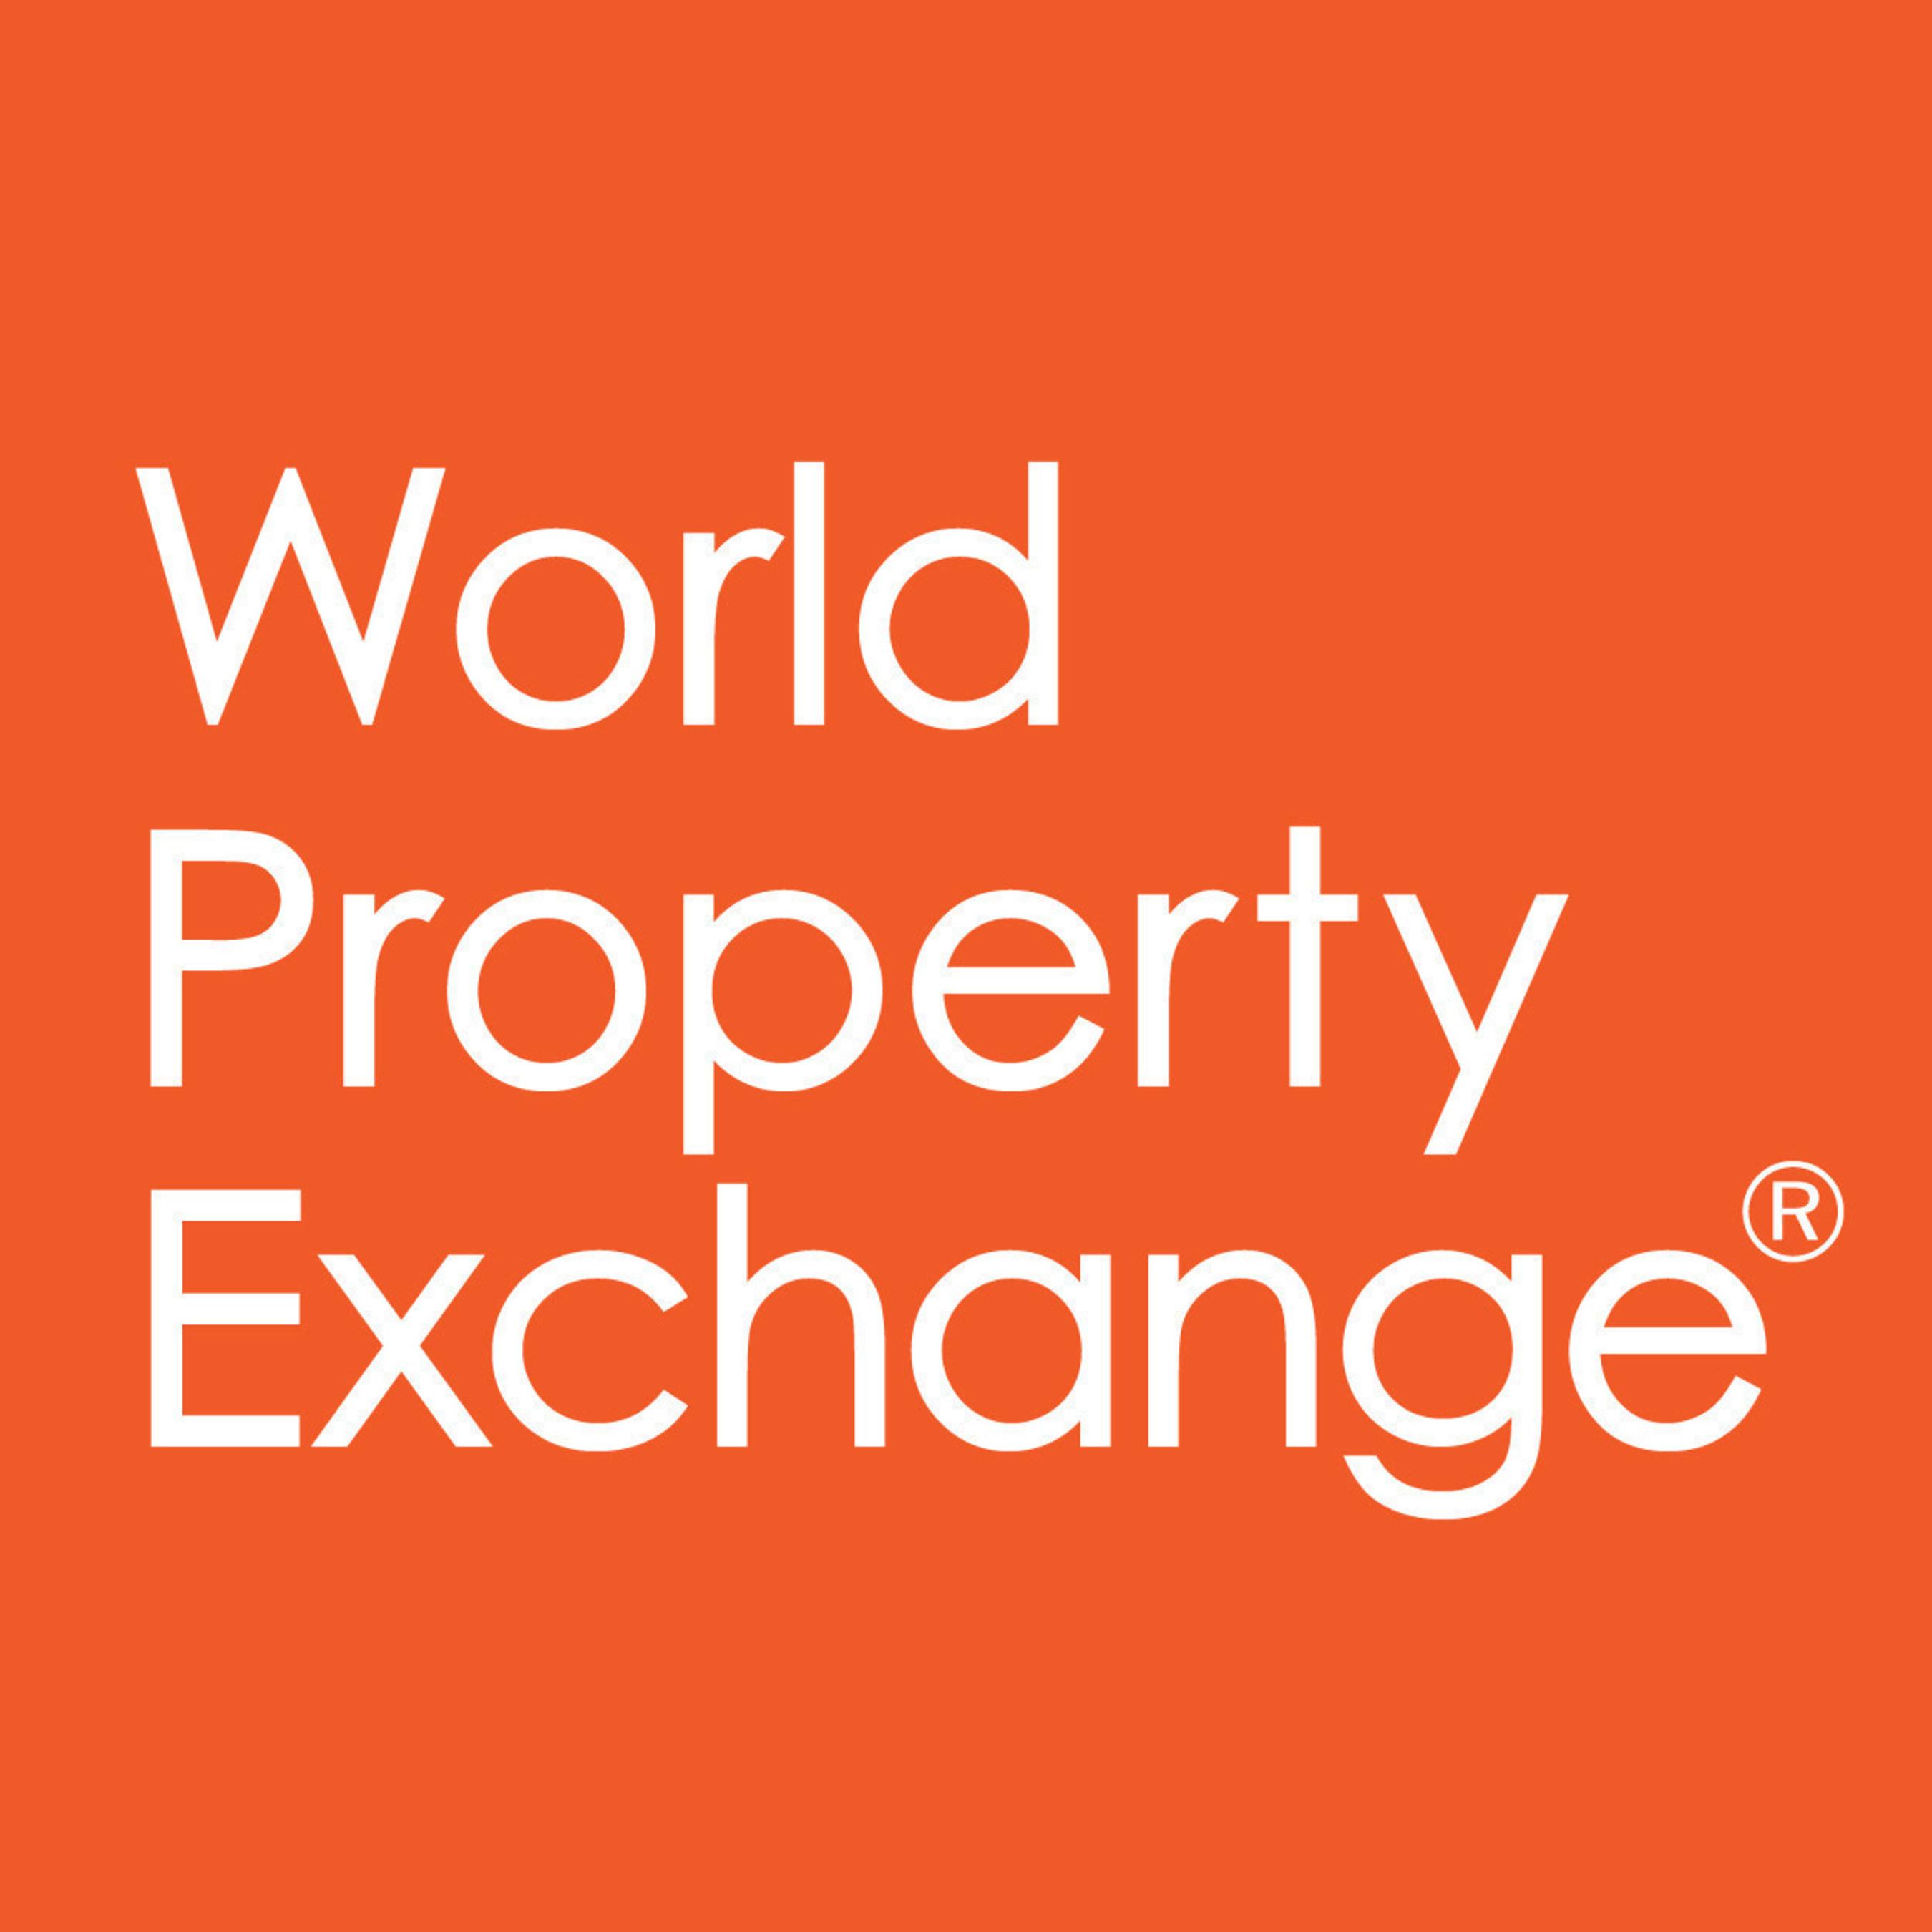 Former Wall Street, Disney Execs Join World Property Exchange Advisory Board